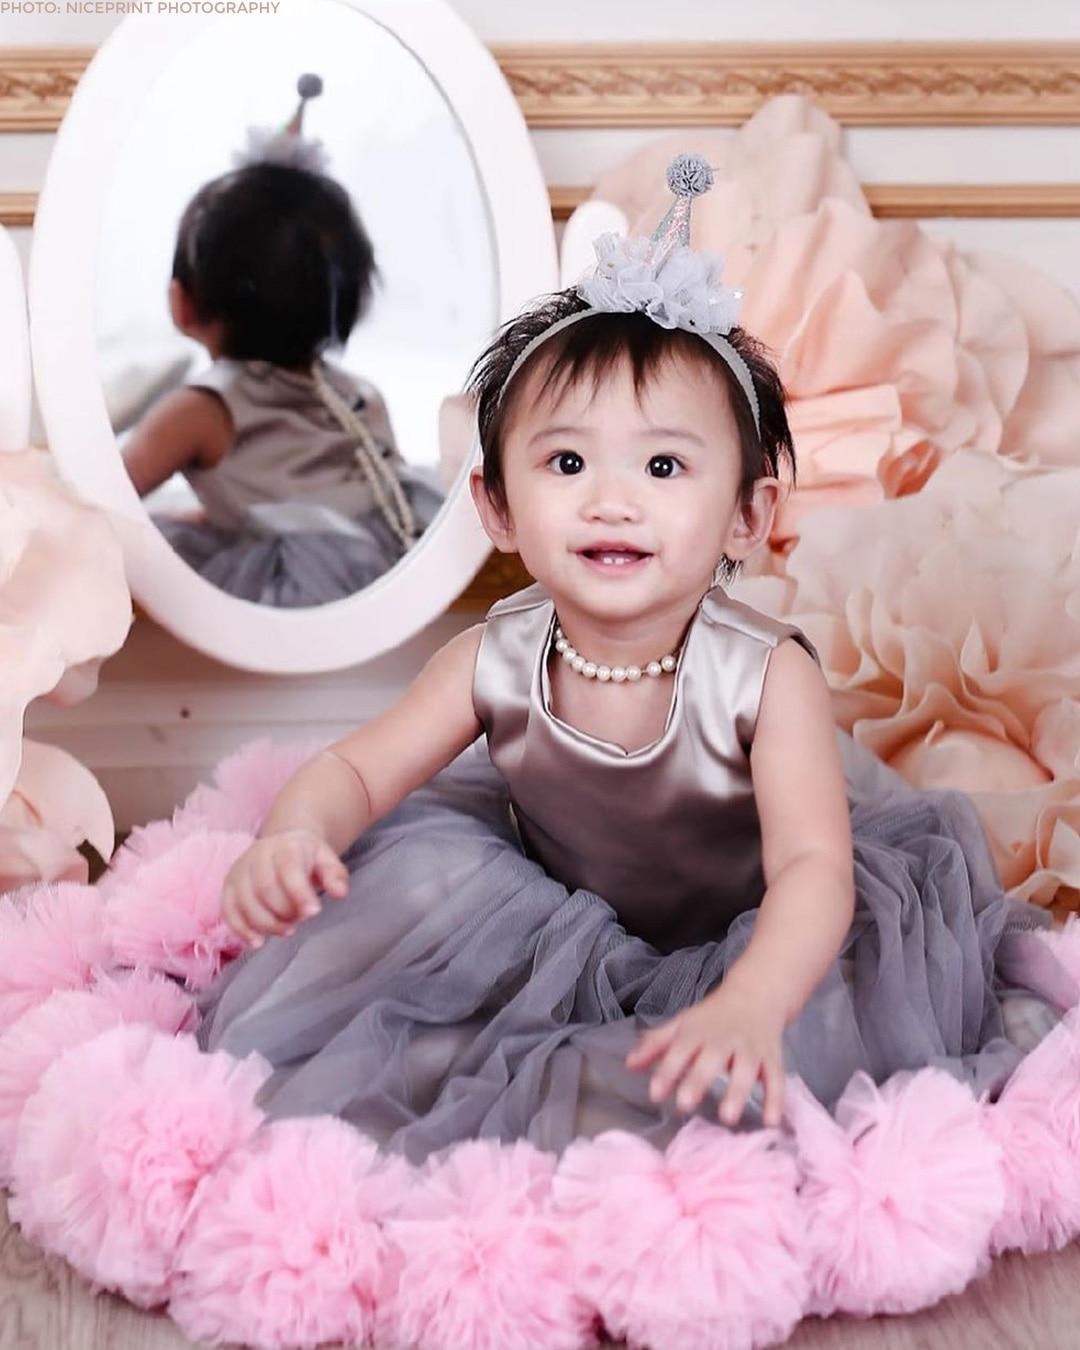 Lily Soberano turns one!